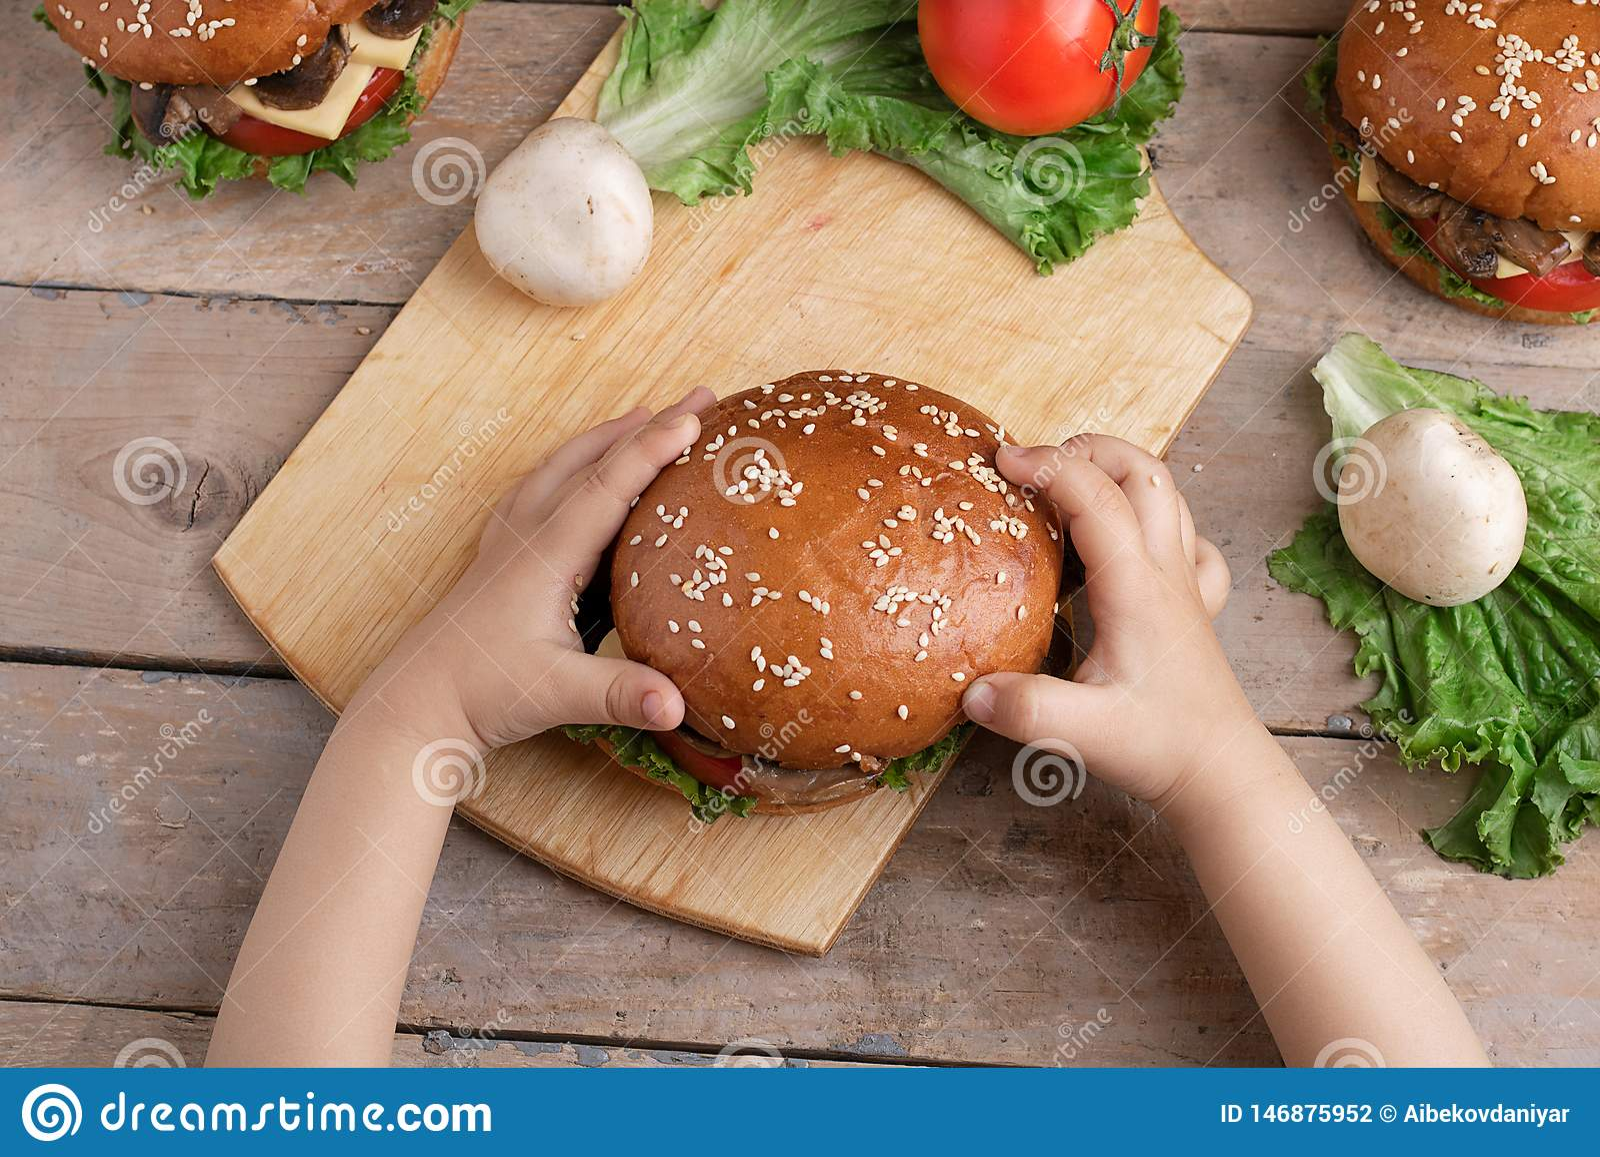 Het kind houdt rond paddestoelhamburger, rauwe groenten